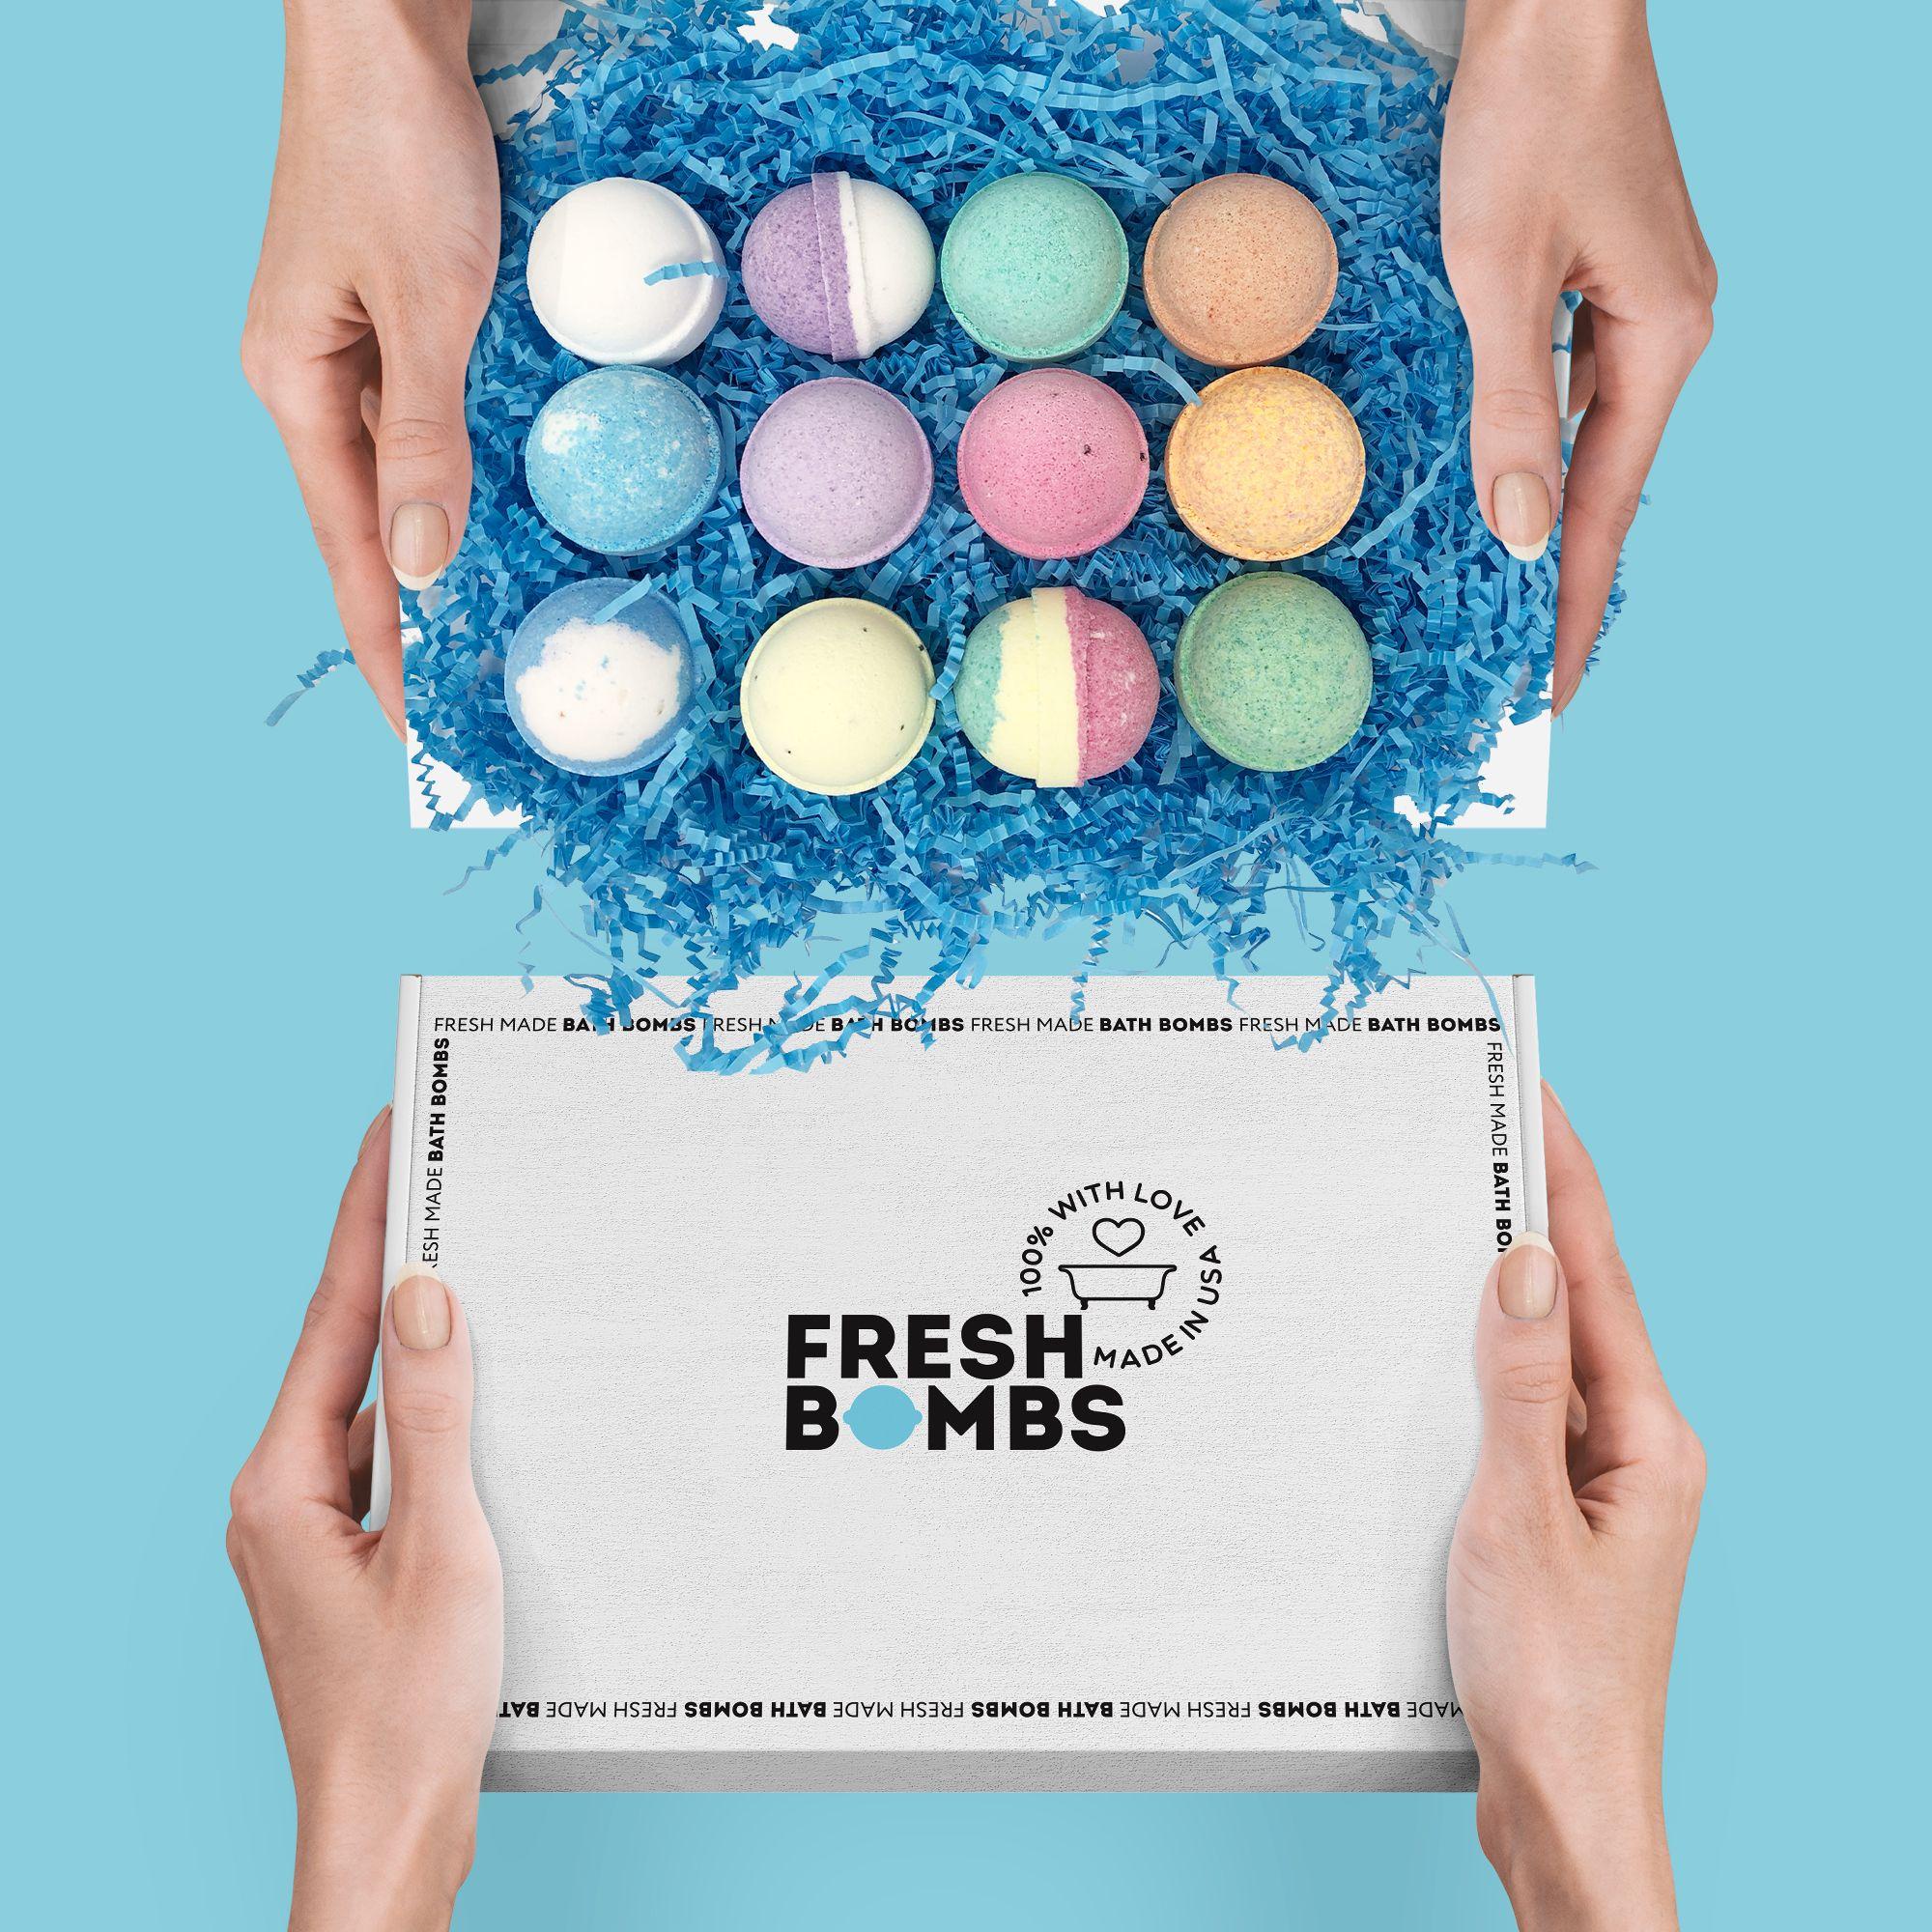 Box of fresh bath bombs 19,90 dollars on Amazon use 15% ...